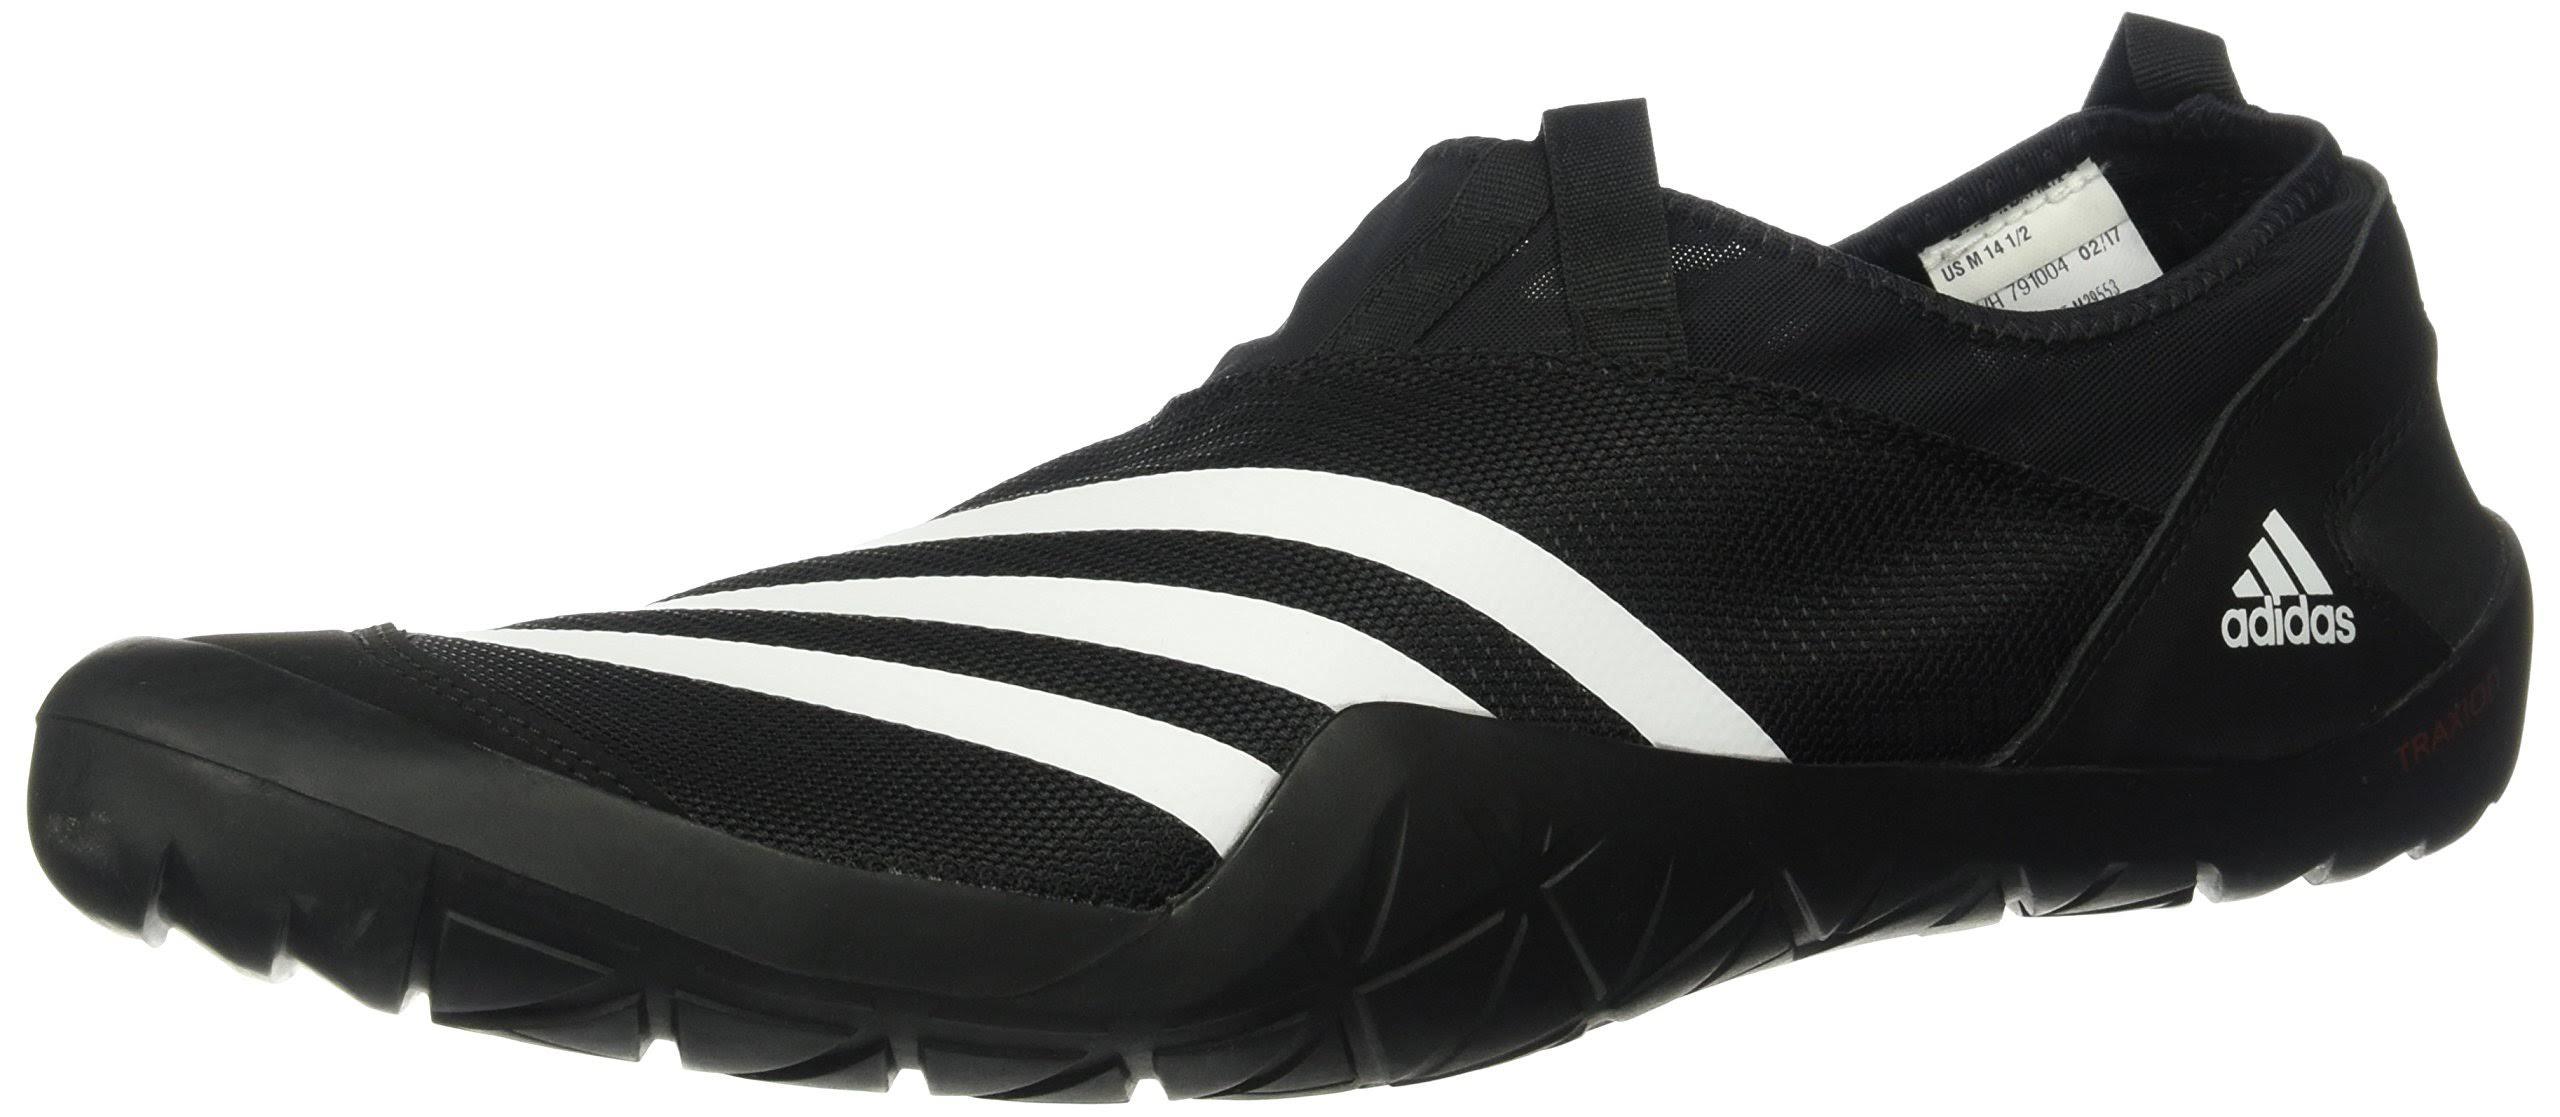 Para Climacool Blanco Negro Jawpaw Hombre Tamaño On Slip Black Adidas Met Plateado 9 qYwd4aY